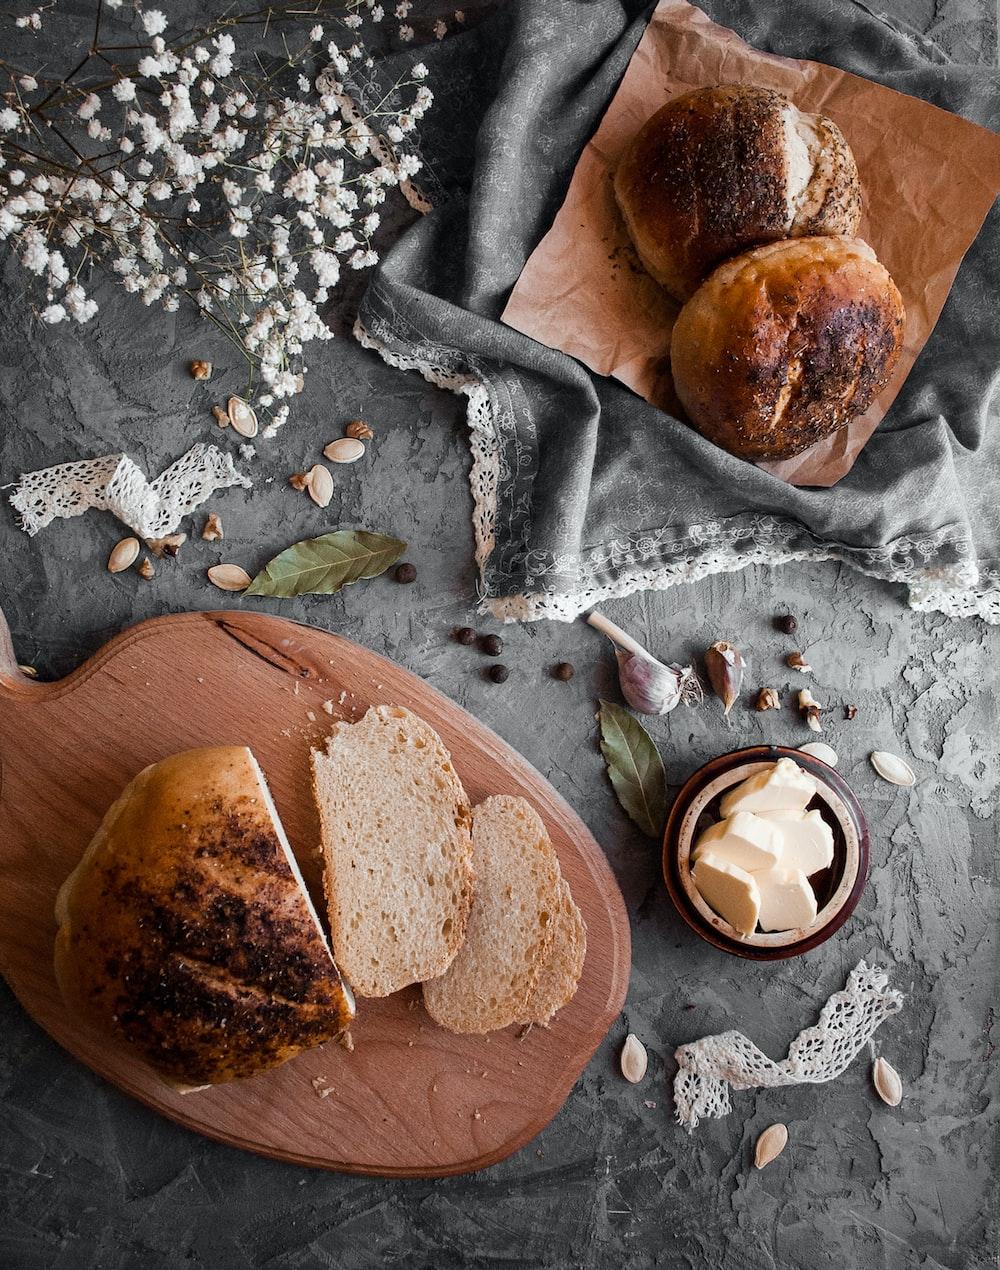 brown bread on grey textile near white flower